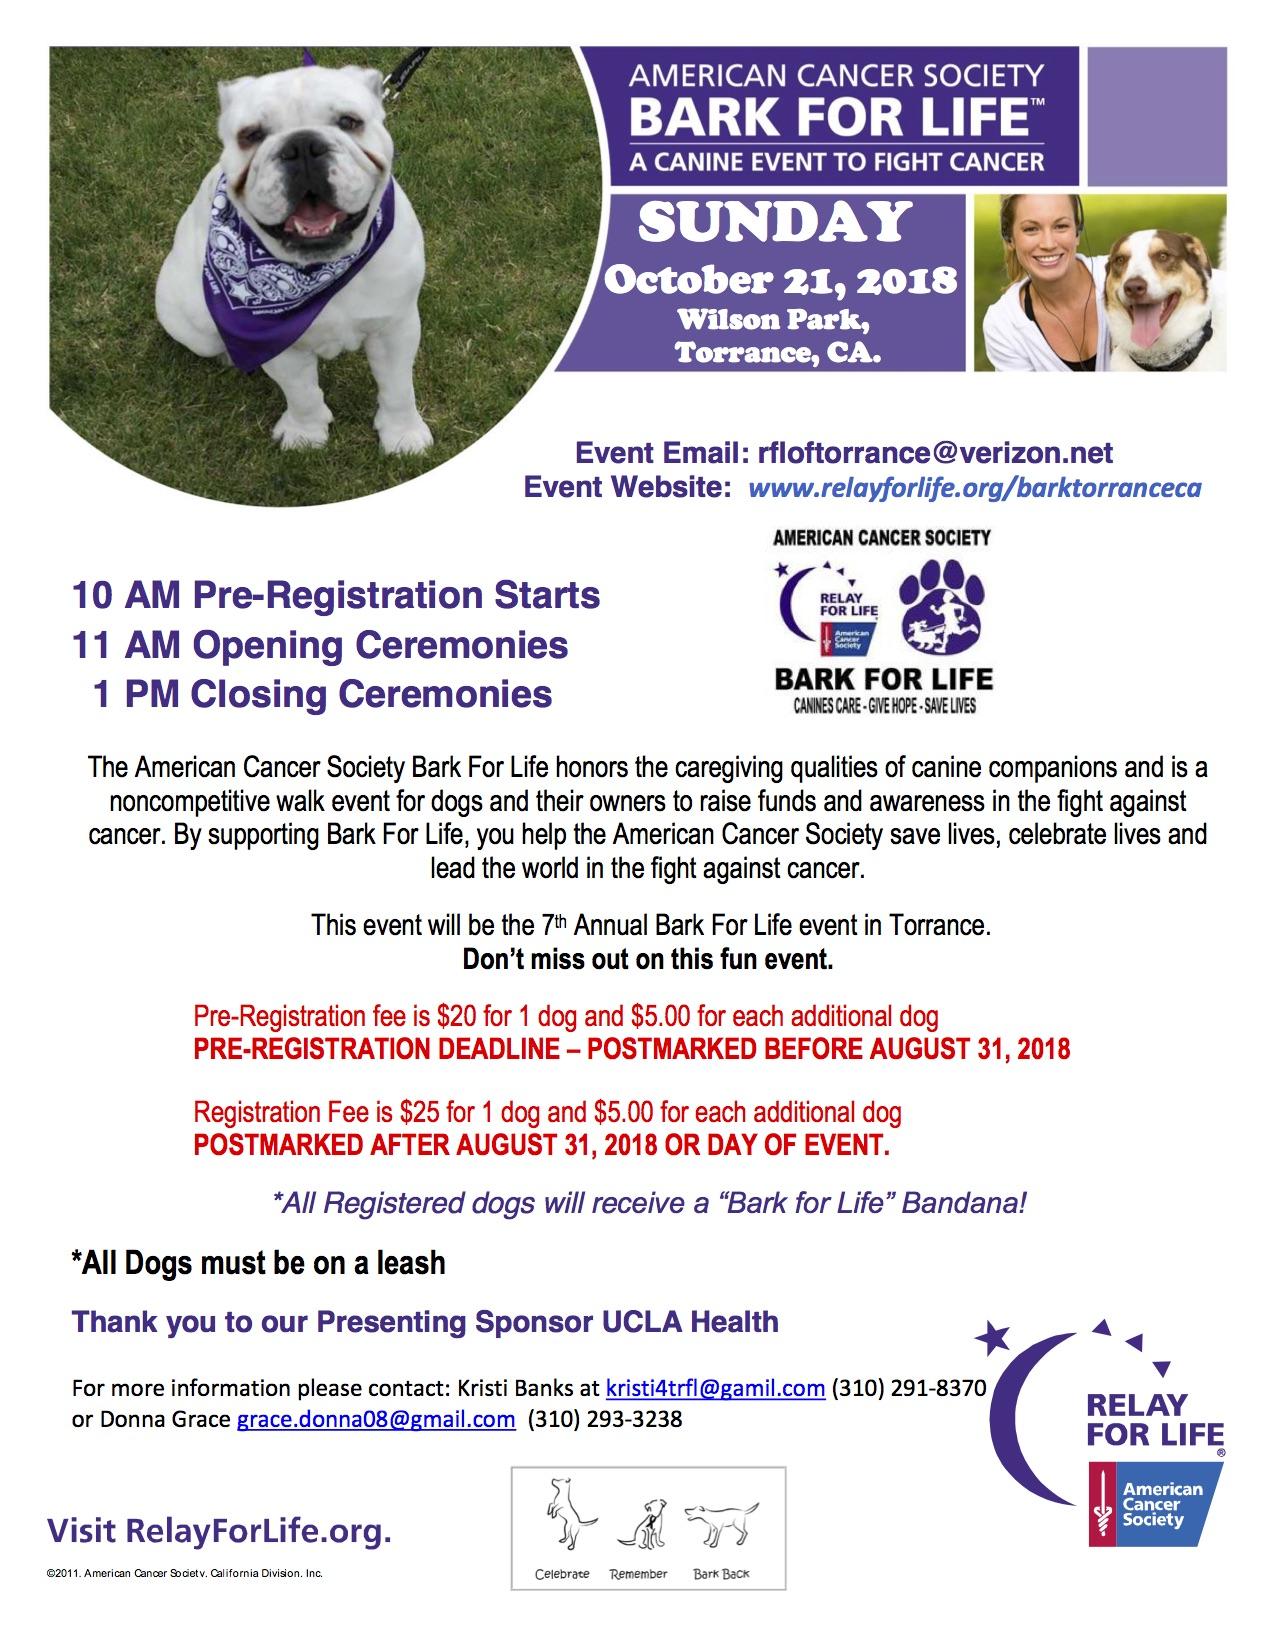 American Cancer Society's Bark for Life Torrance (CA